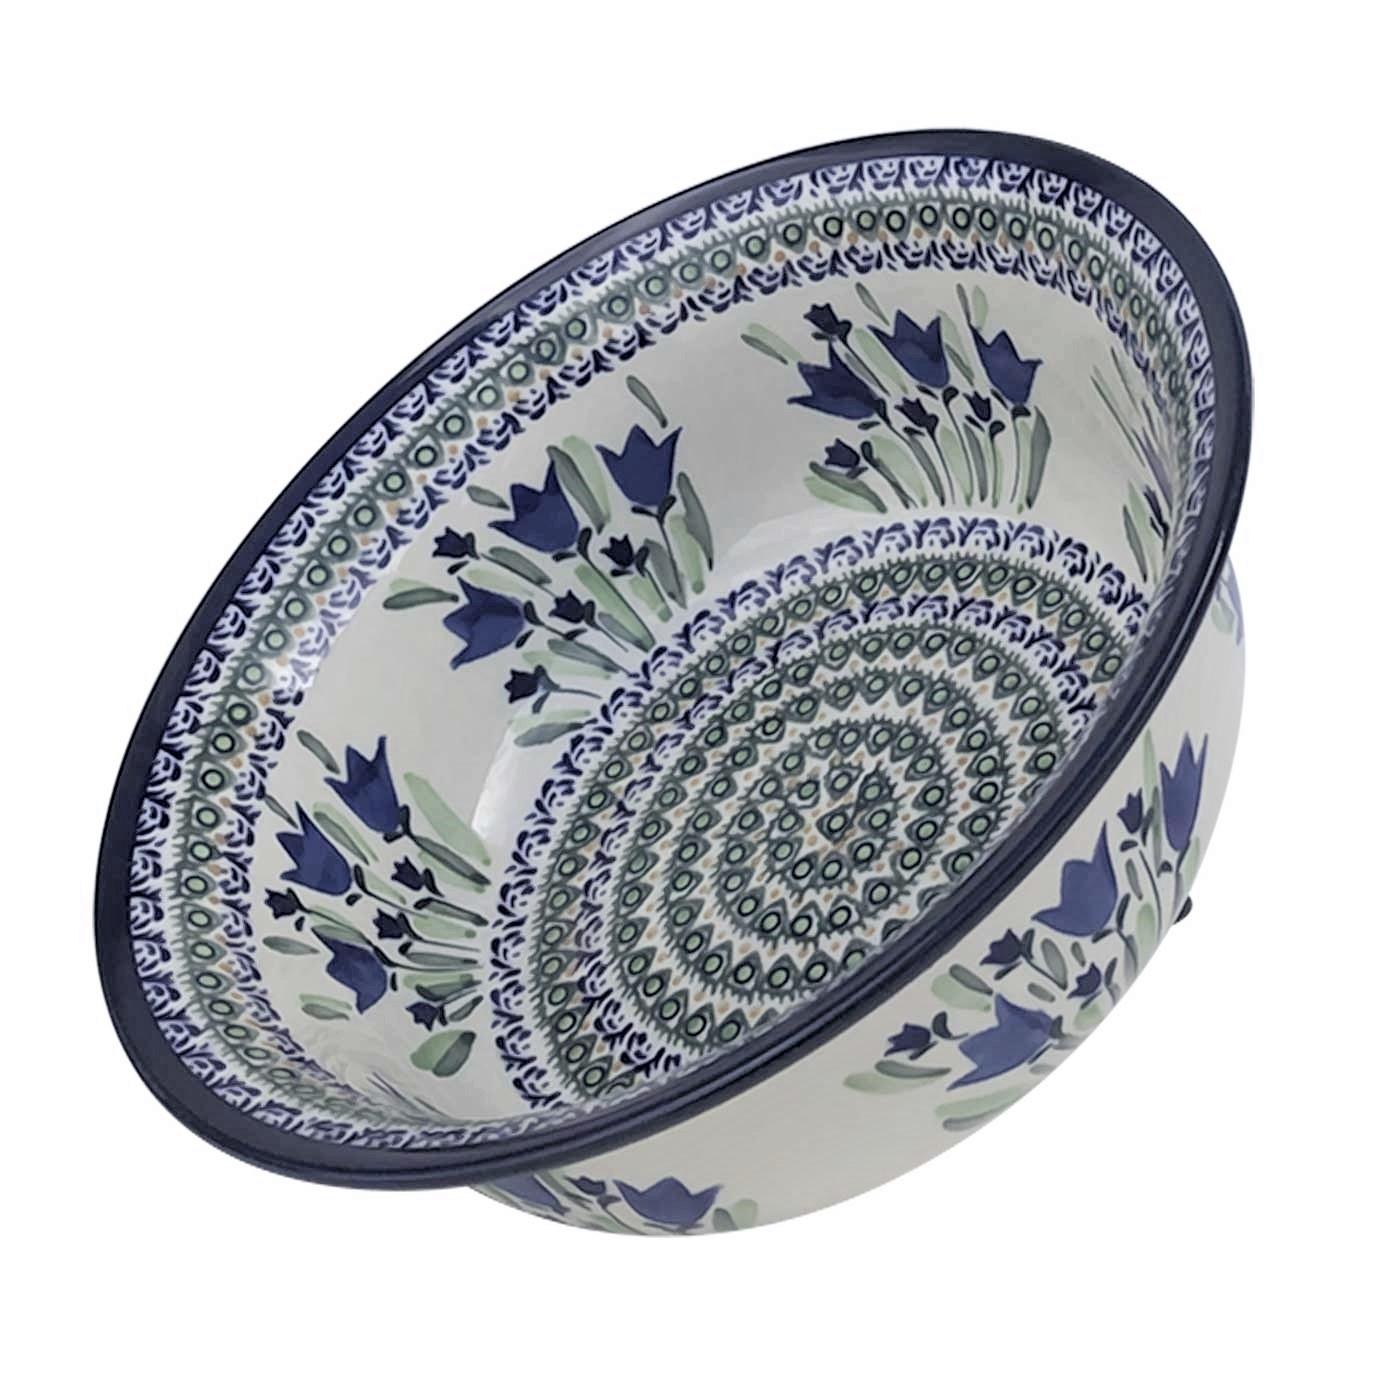 Pottery Avenue 61-oz Flatred Top Stonewfare Bowl - 1605-160AR Blue Tulip